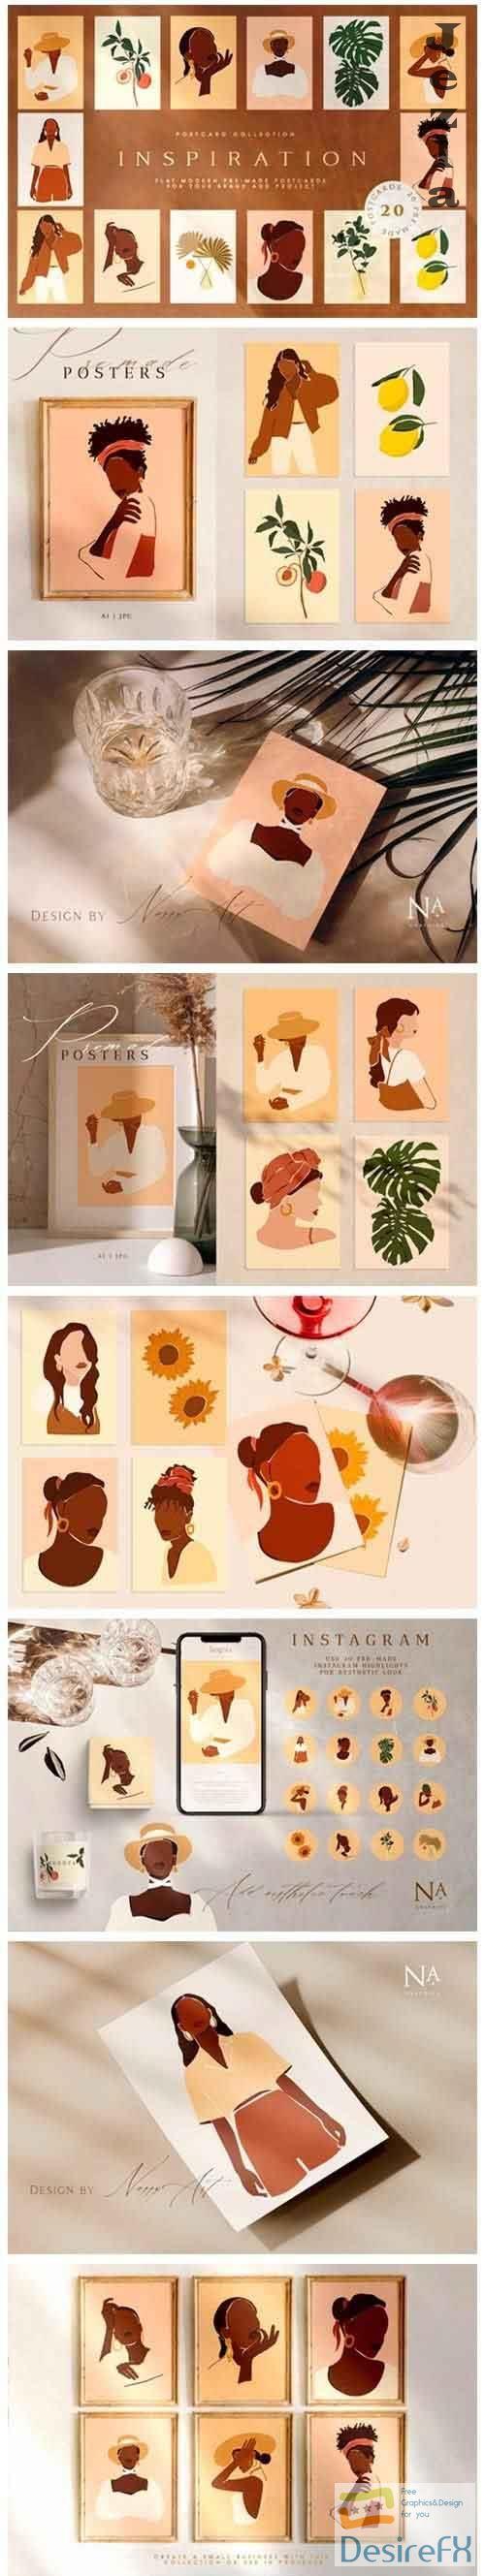 Inspiration Postcard Collection - 5067411